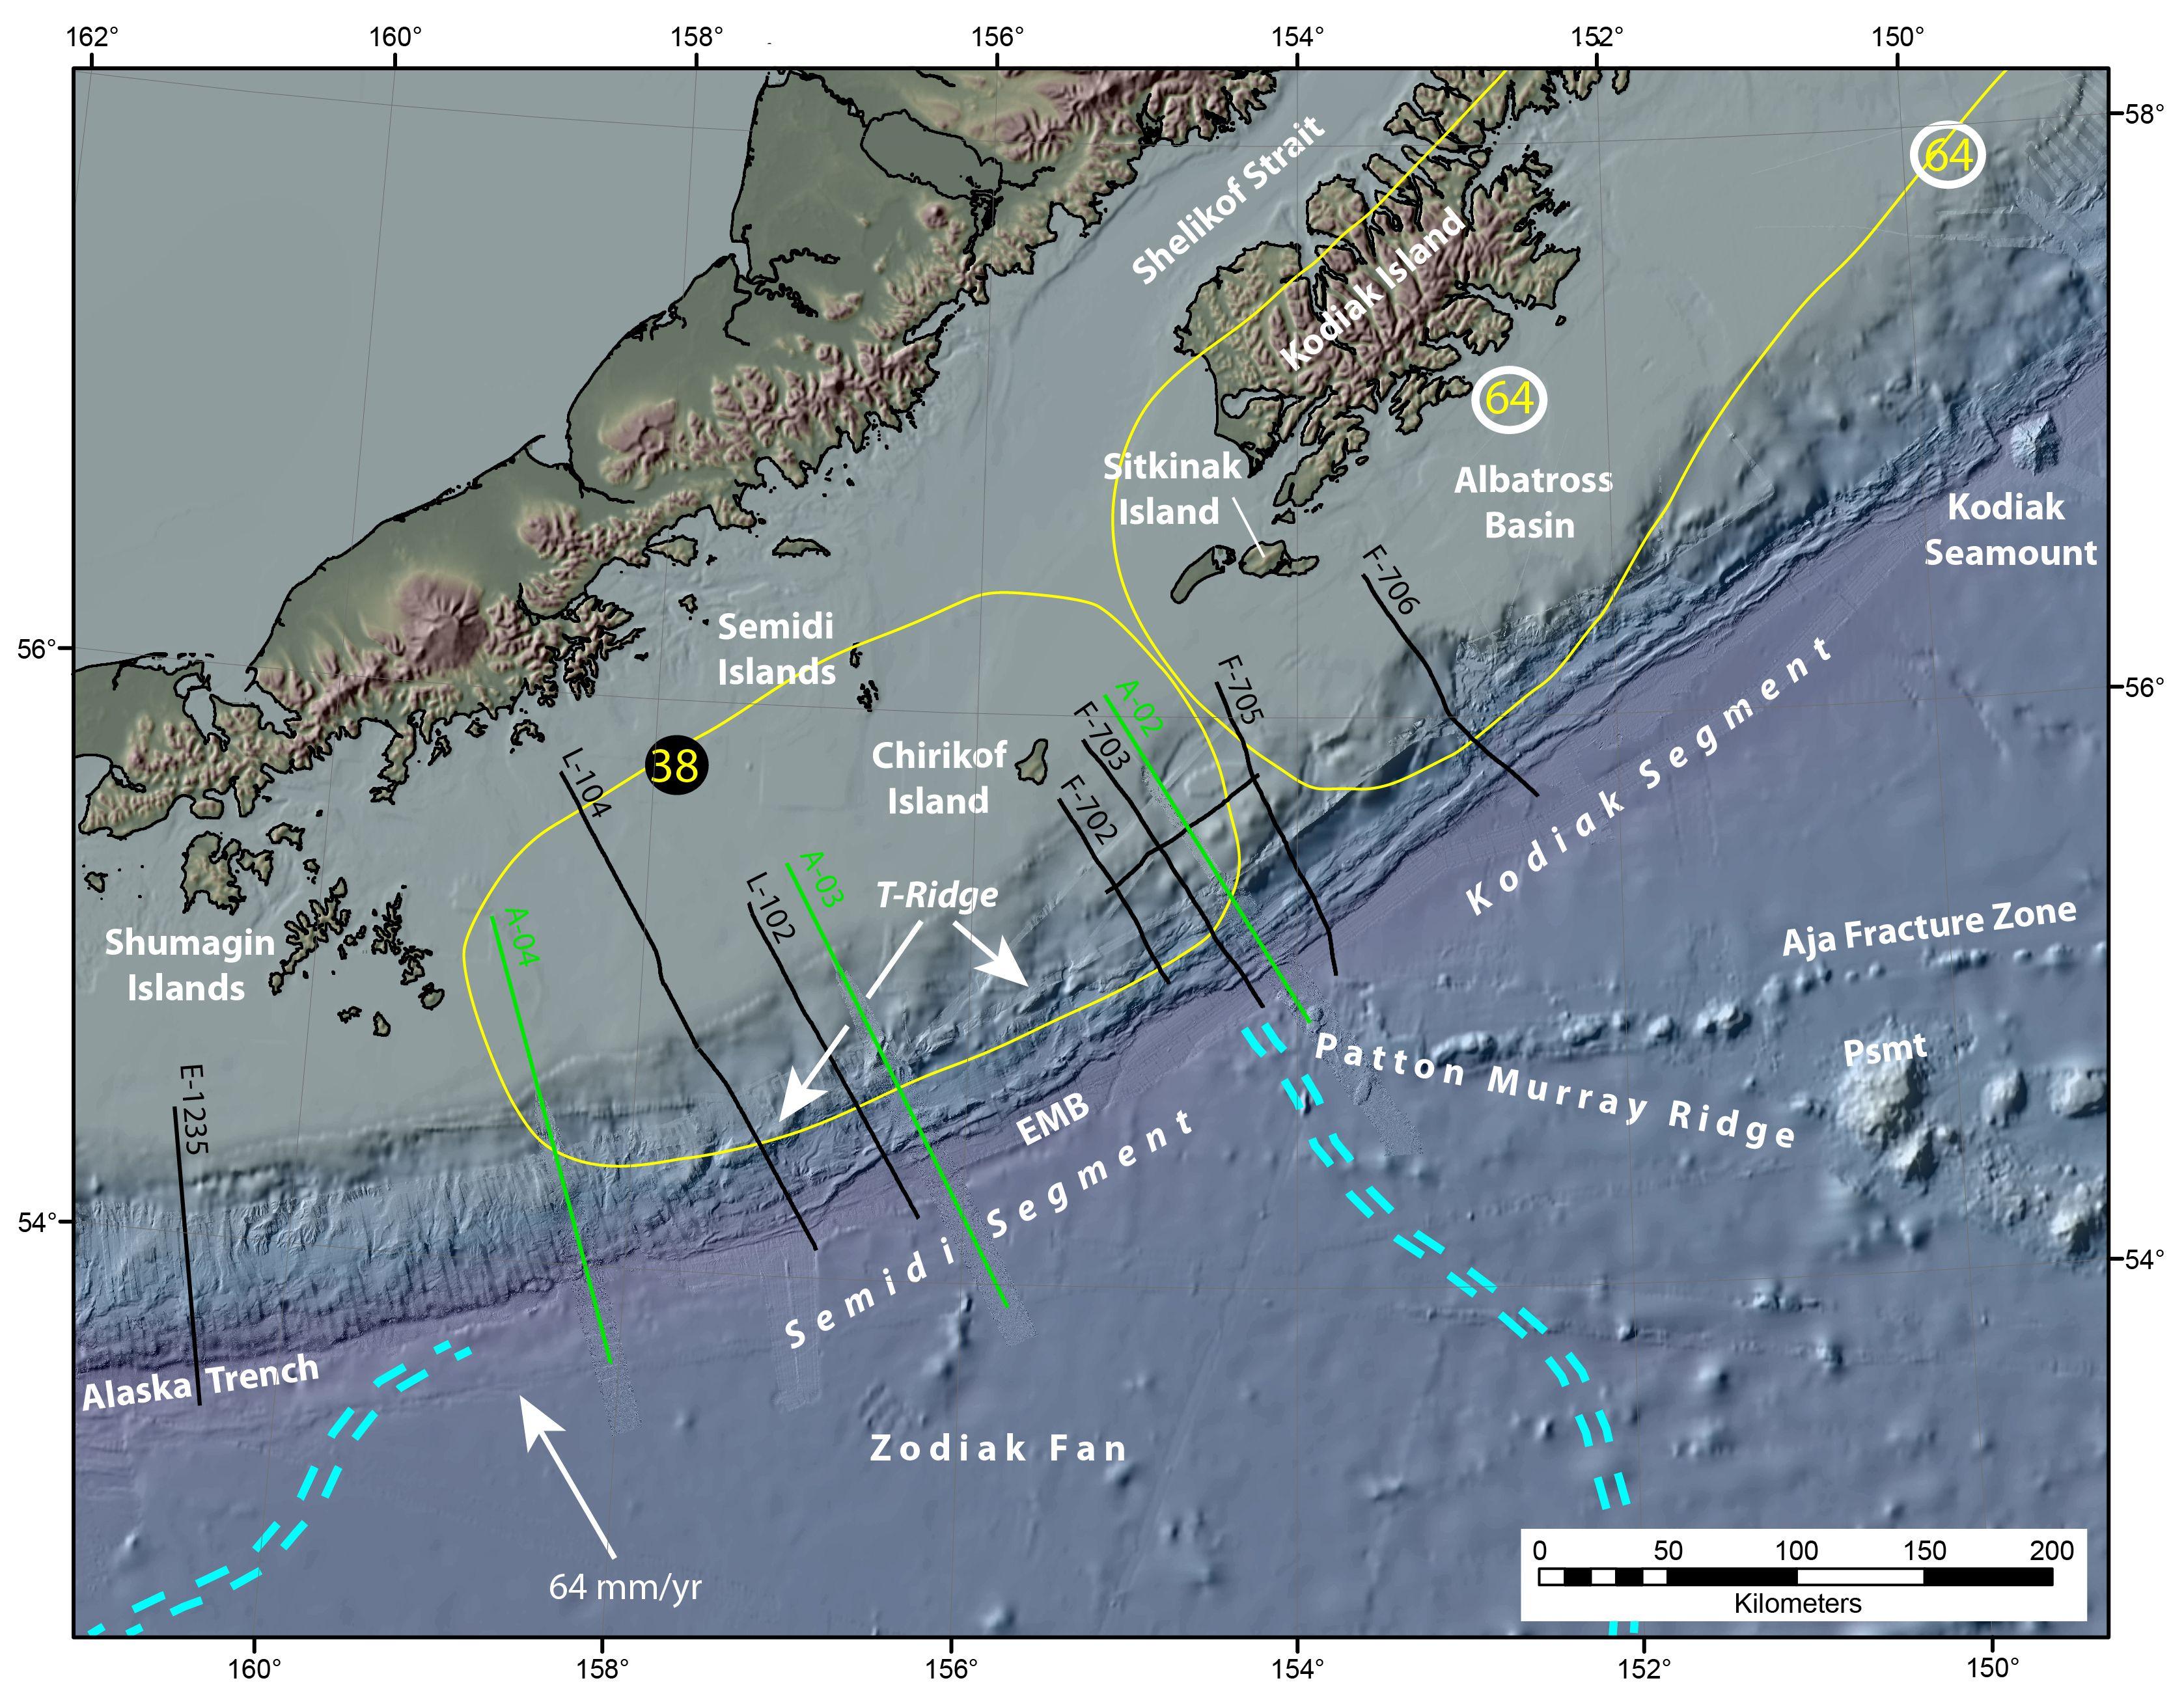 California Quake Map Usgs%0A Alaska u    s Subduction Zone and Potential for Large Tsunamis   Science    UNAVCO   Figure courtesy of